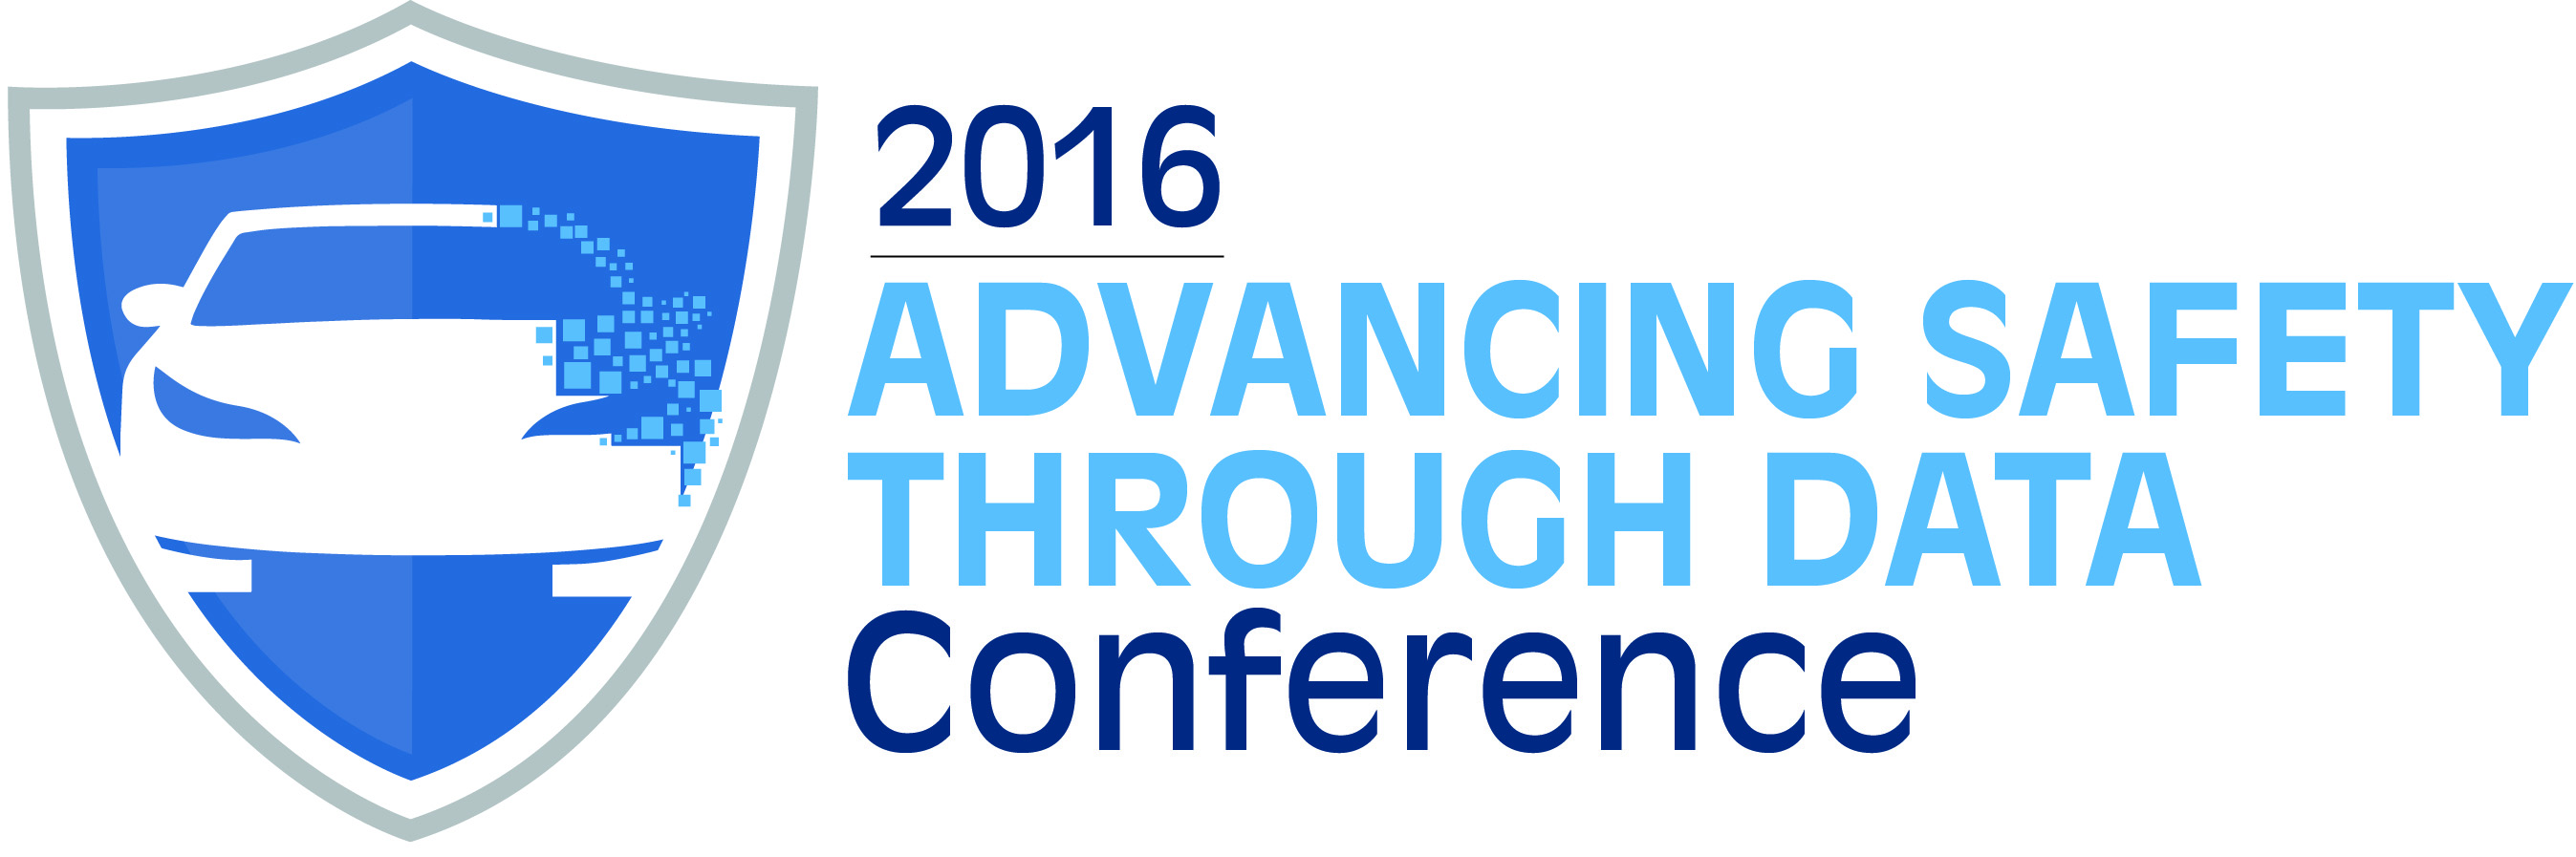 Advancing Safety Through Data Conference Logo v2